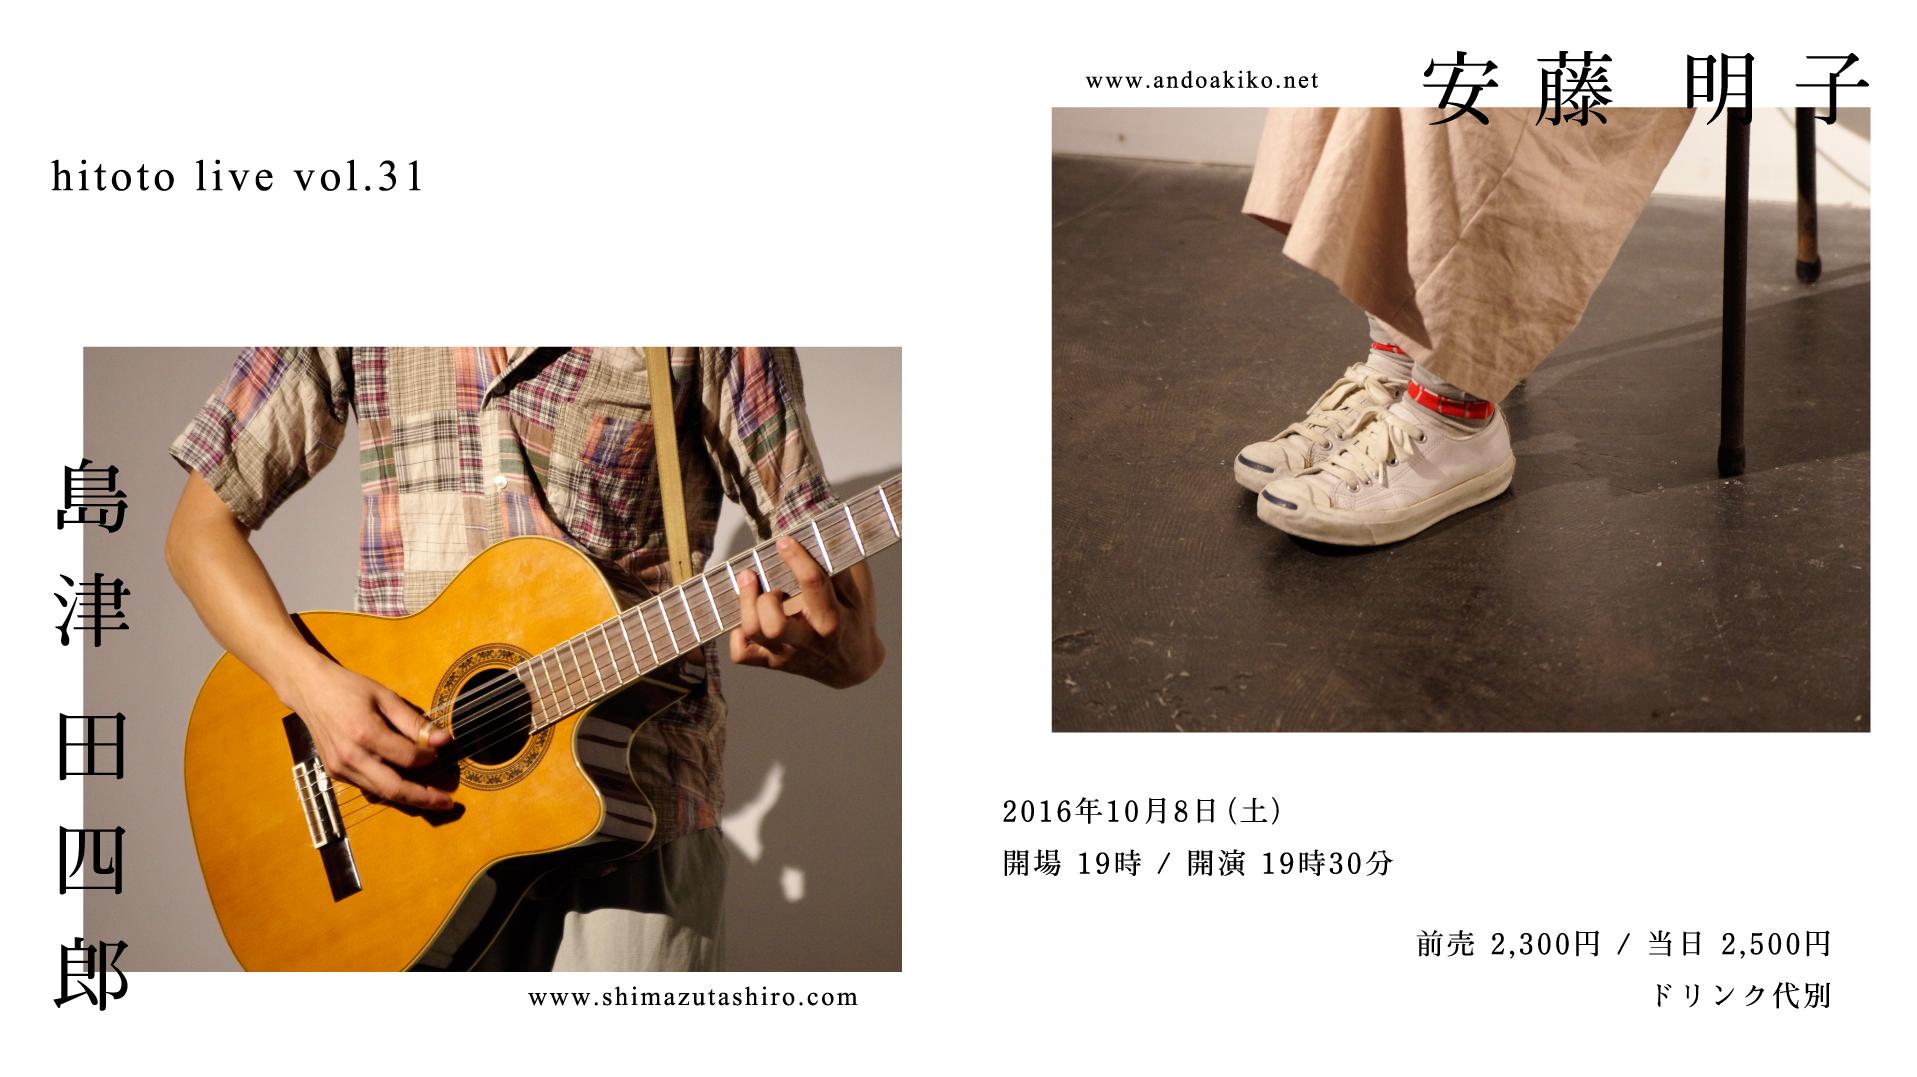 hitoto live vol.31 島津田四郎・安藤明子